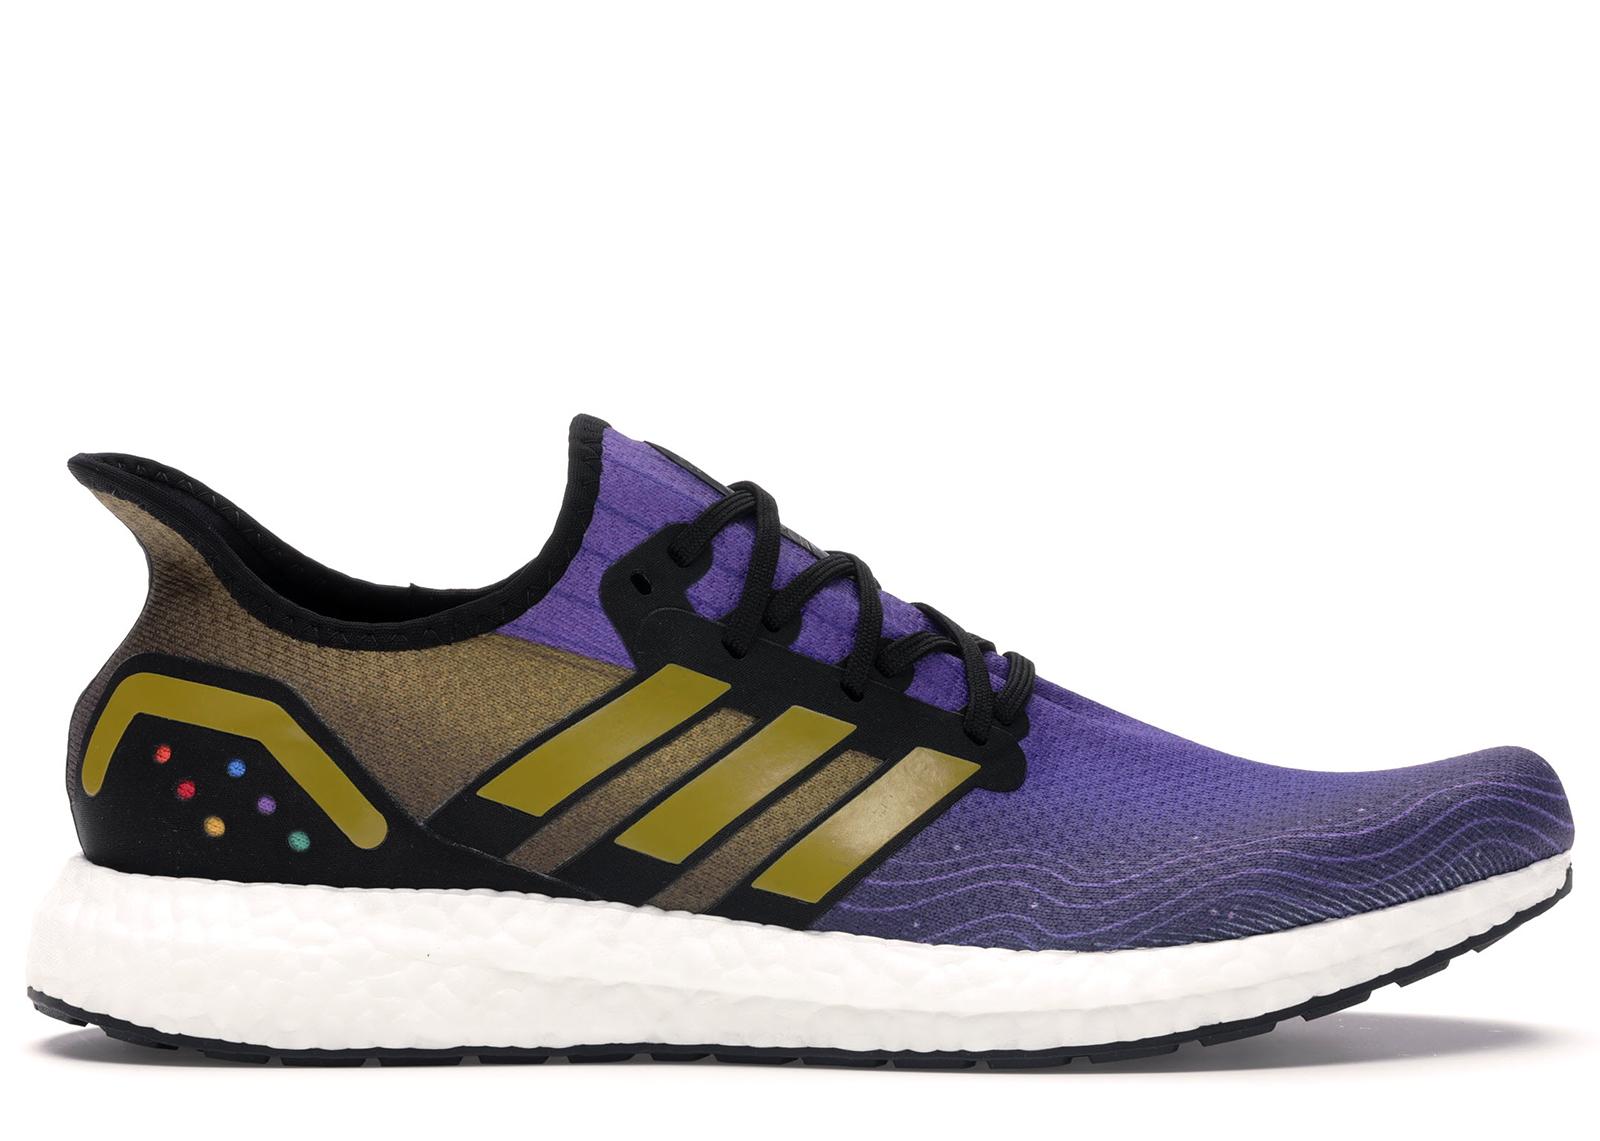 adidas Speedfactory AM4 Thanos